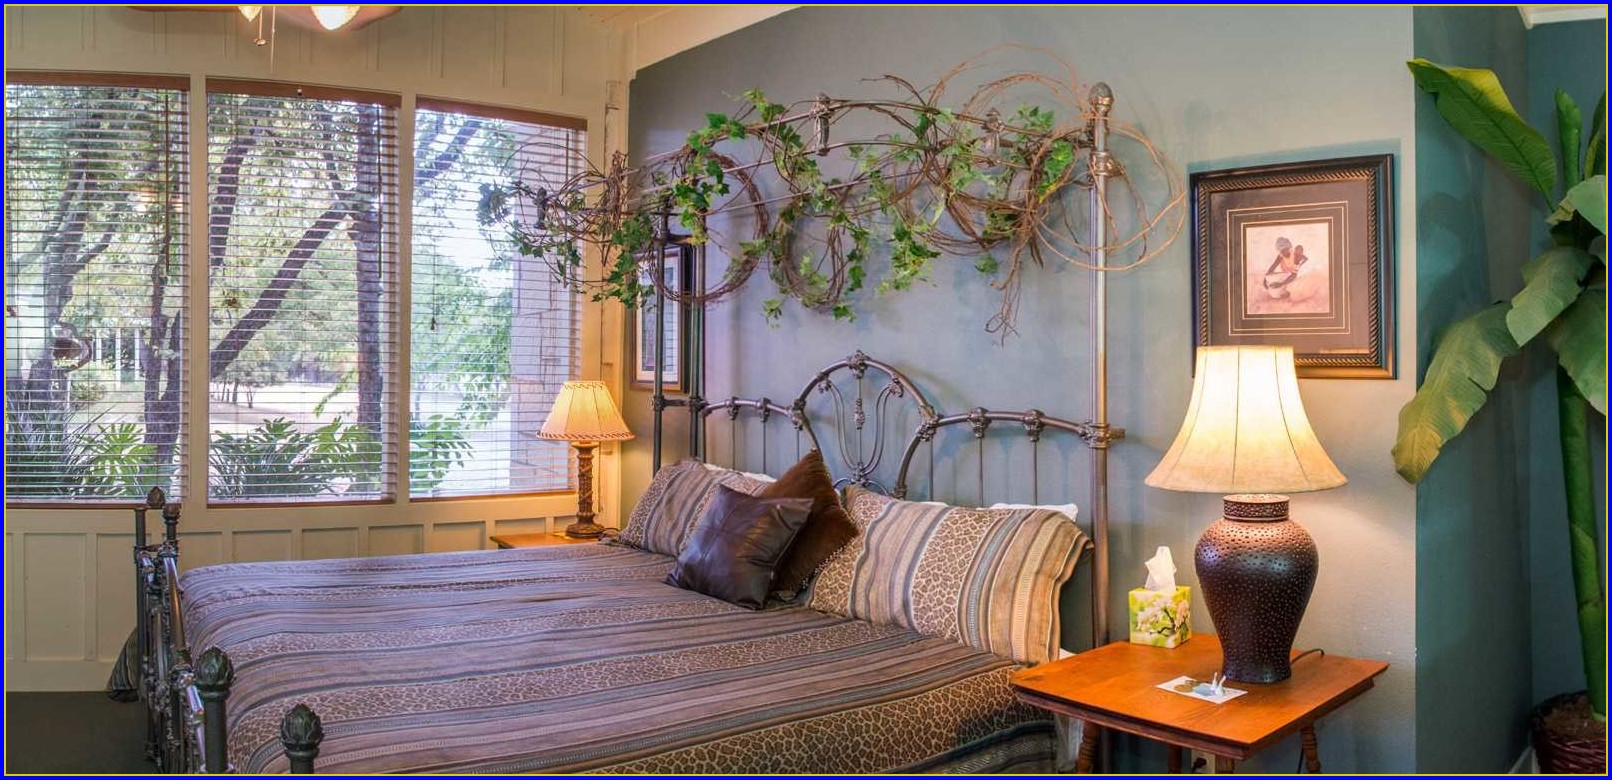 Bed And Breakfast Fredericksburg Tx Pet Friendly